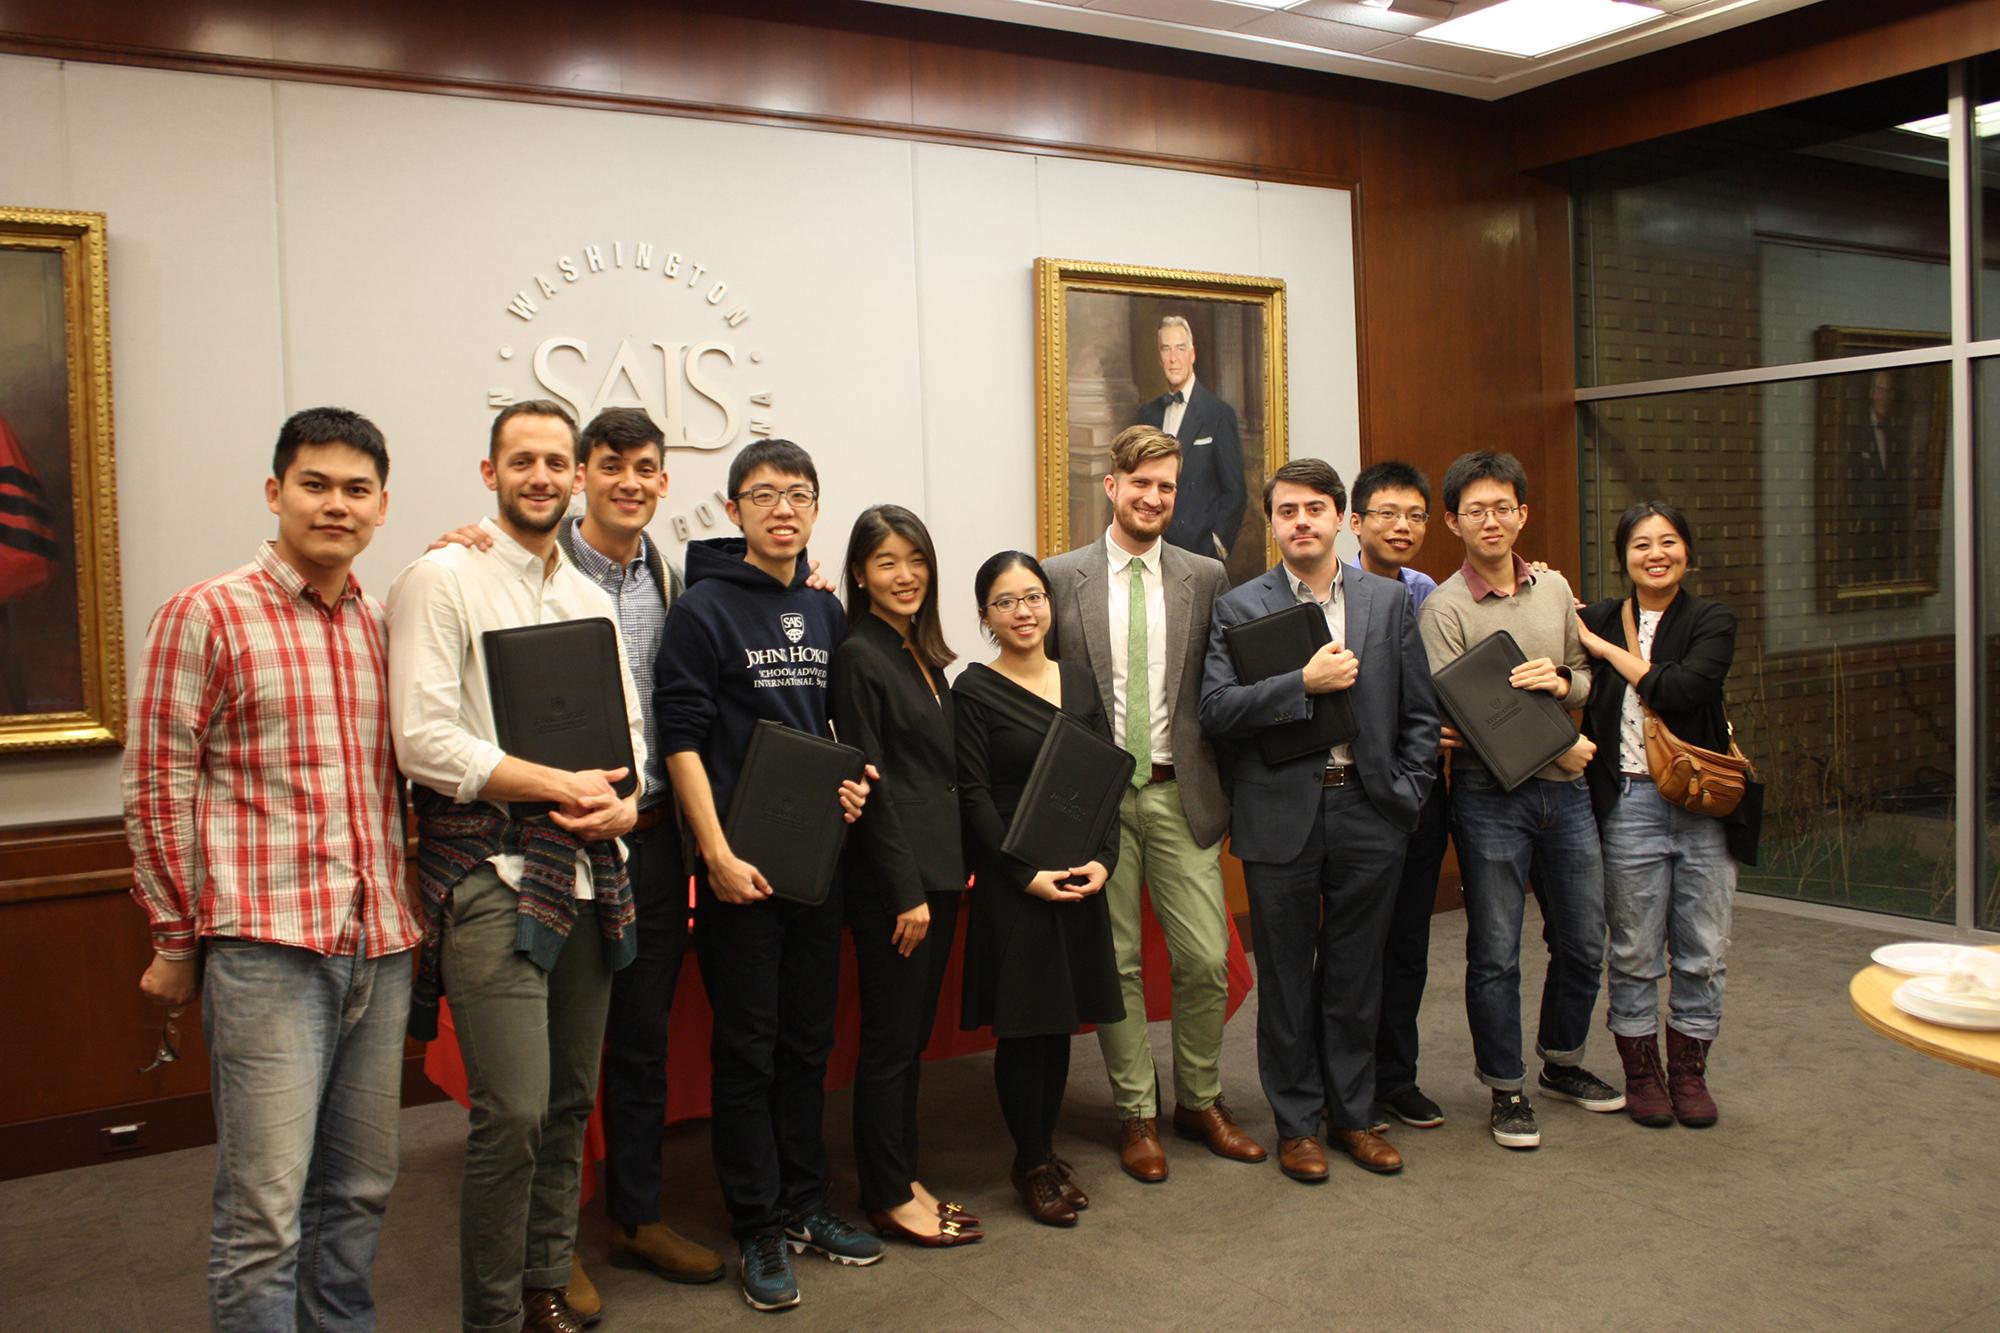 December 2017 graduates of the SAIS-Tsinghua Dual Degree Program in Global Politics and Economics